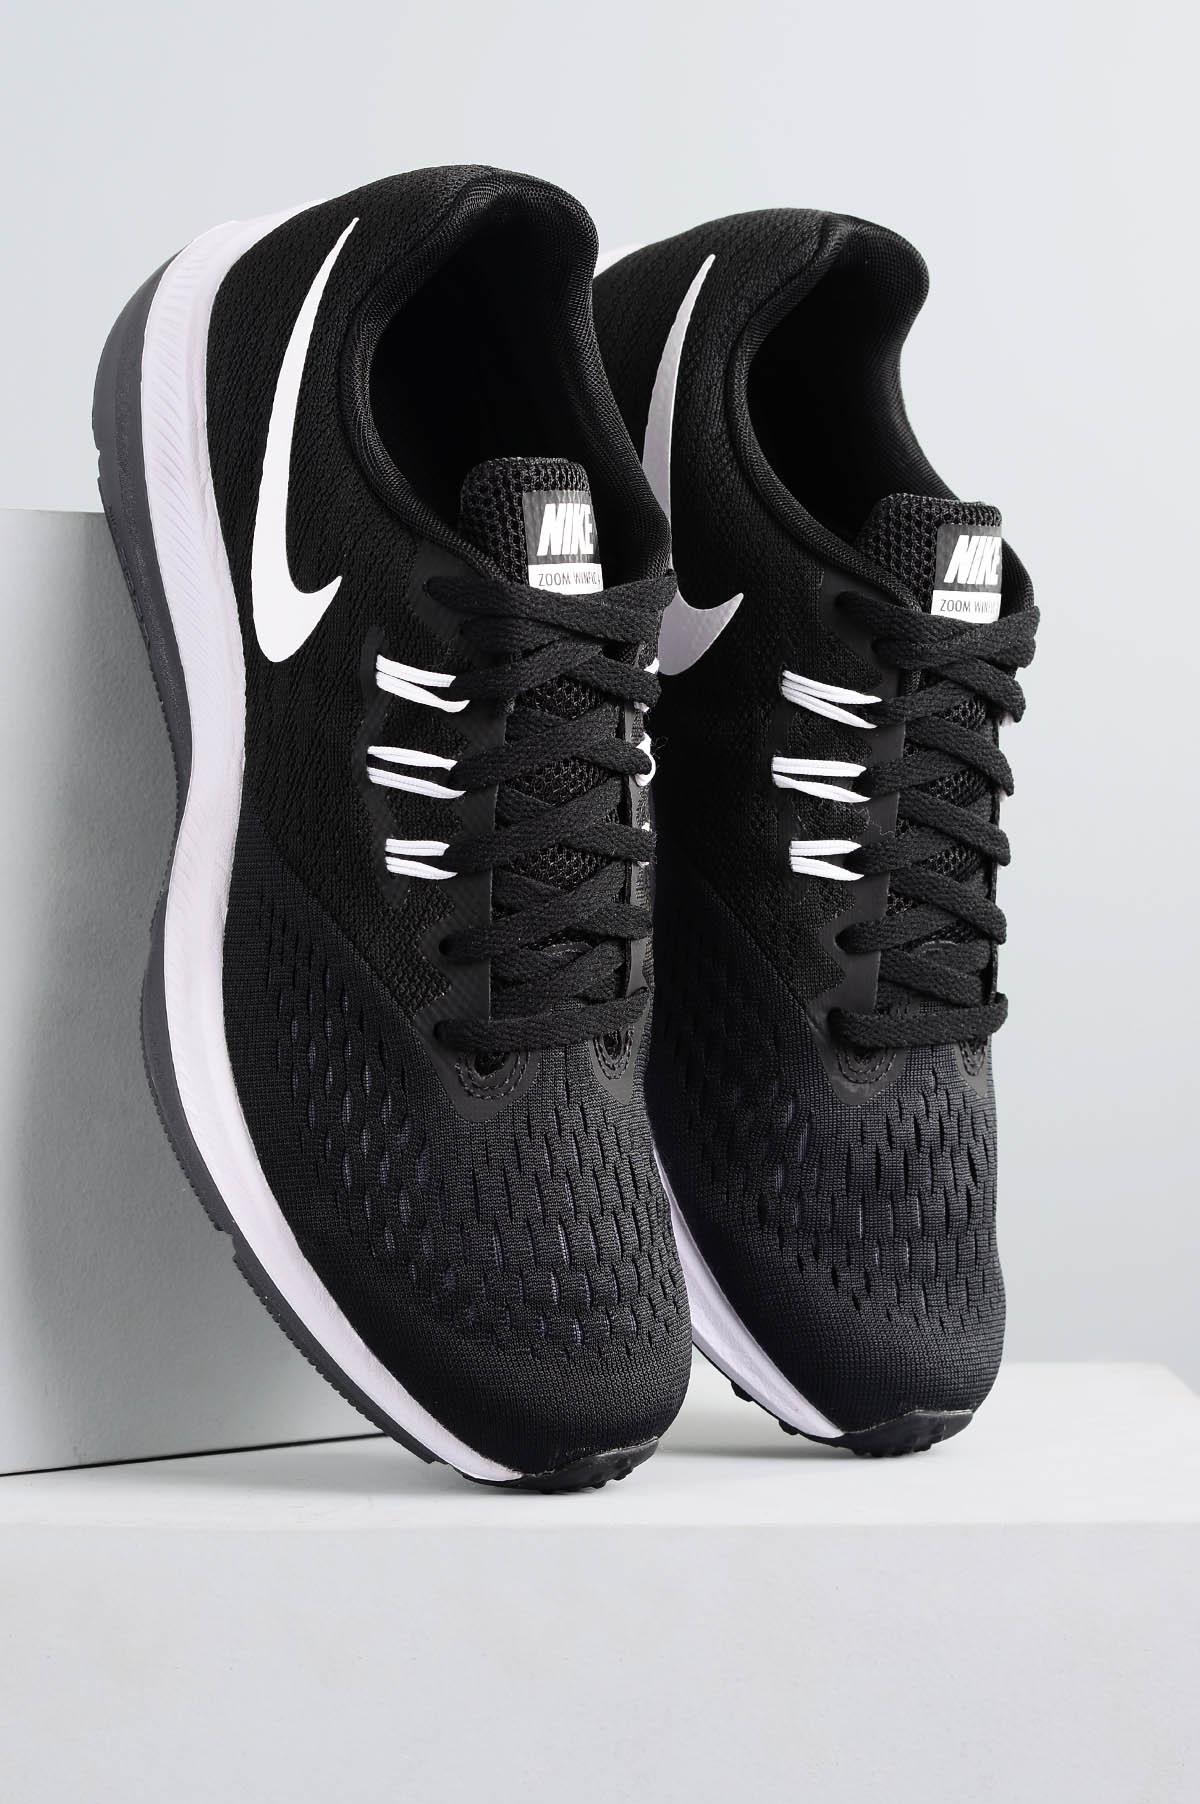 f658a898133 Tênis Masculino Nike Zoom Winflo 4 TEC - PRETO - Mundial Calçados